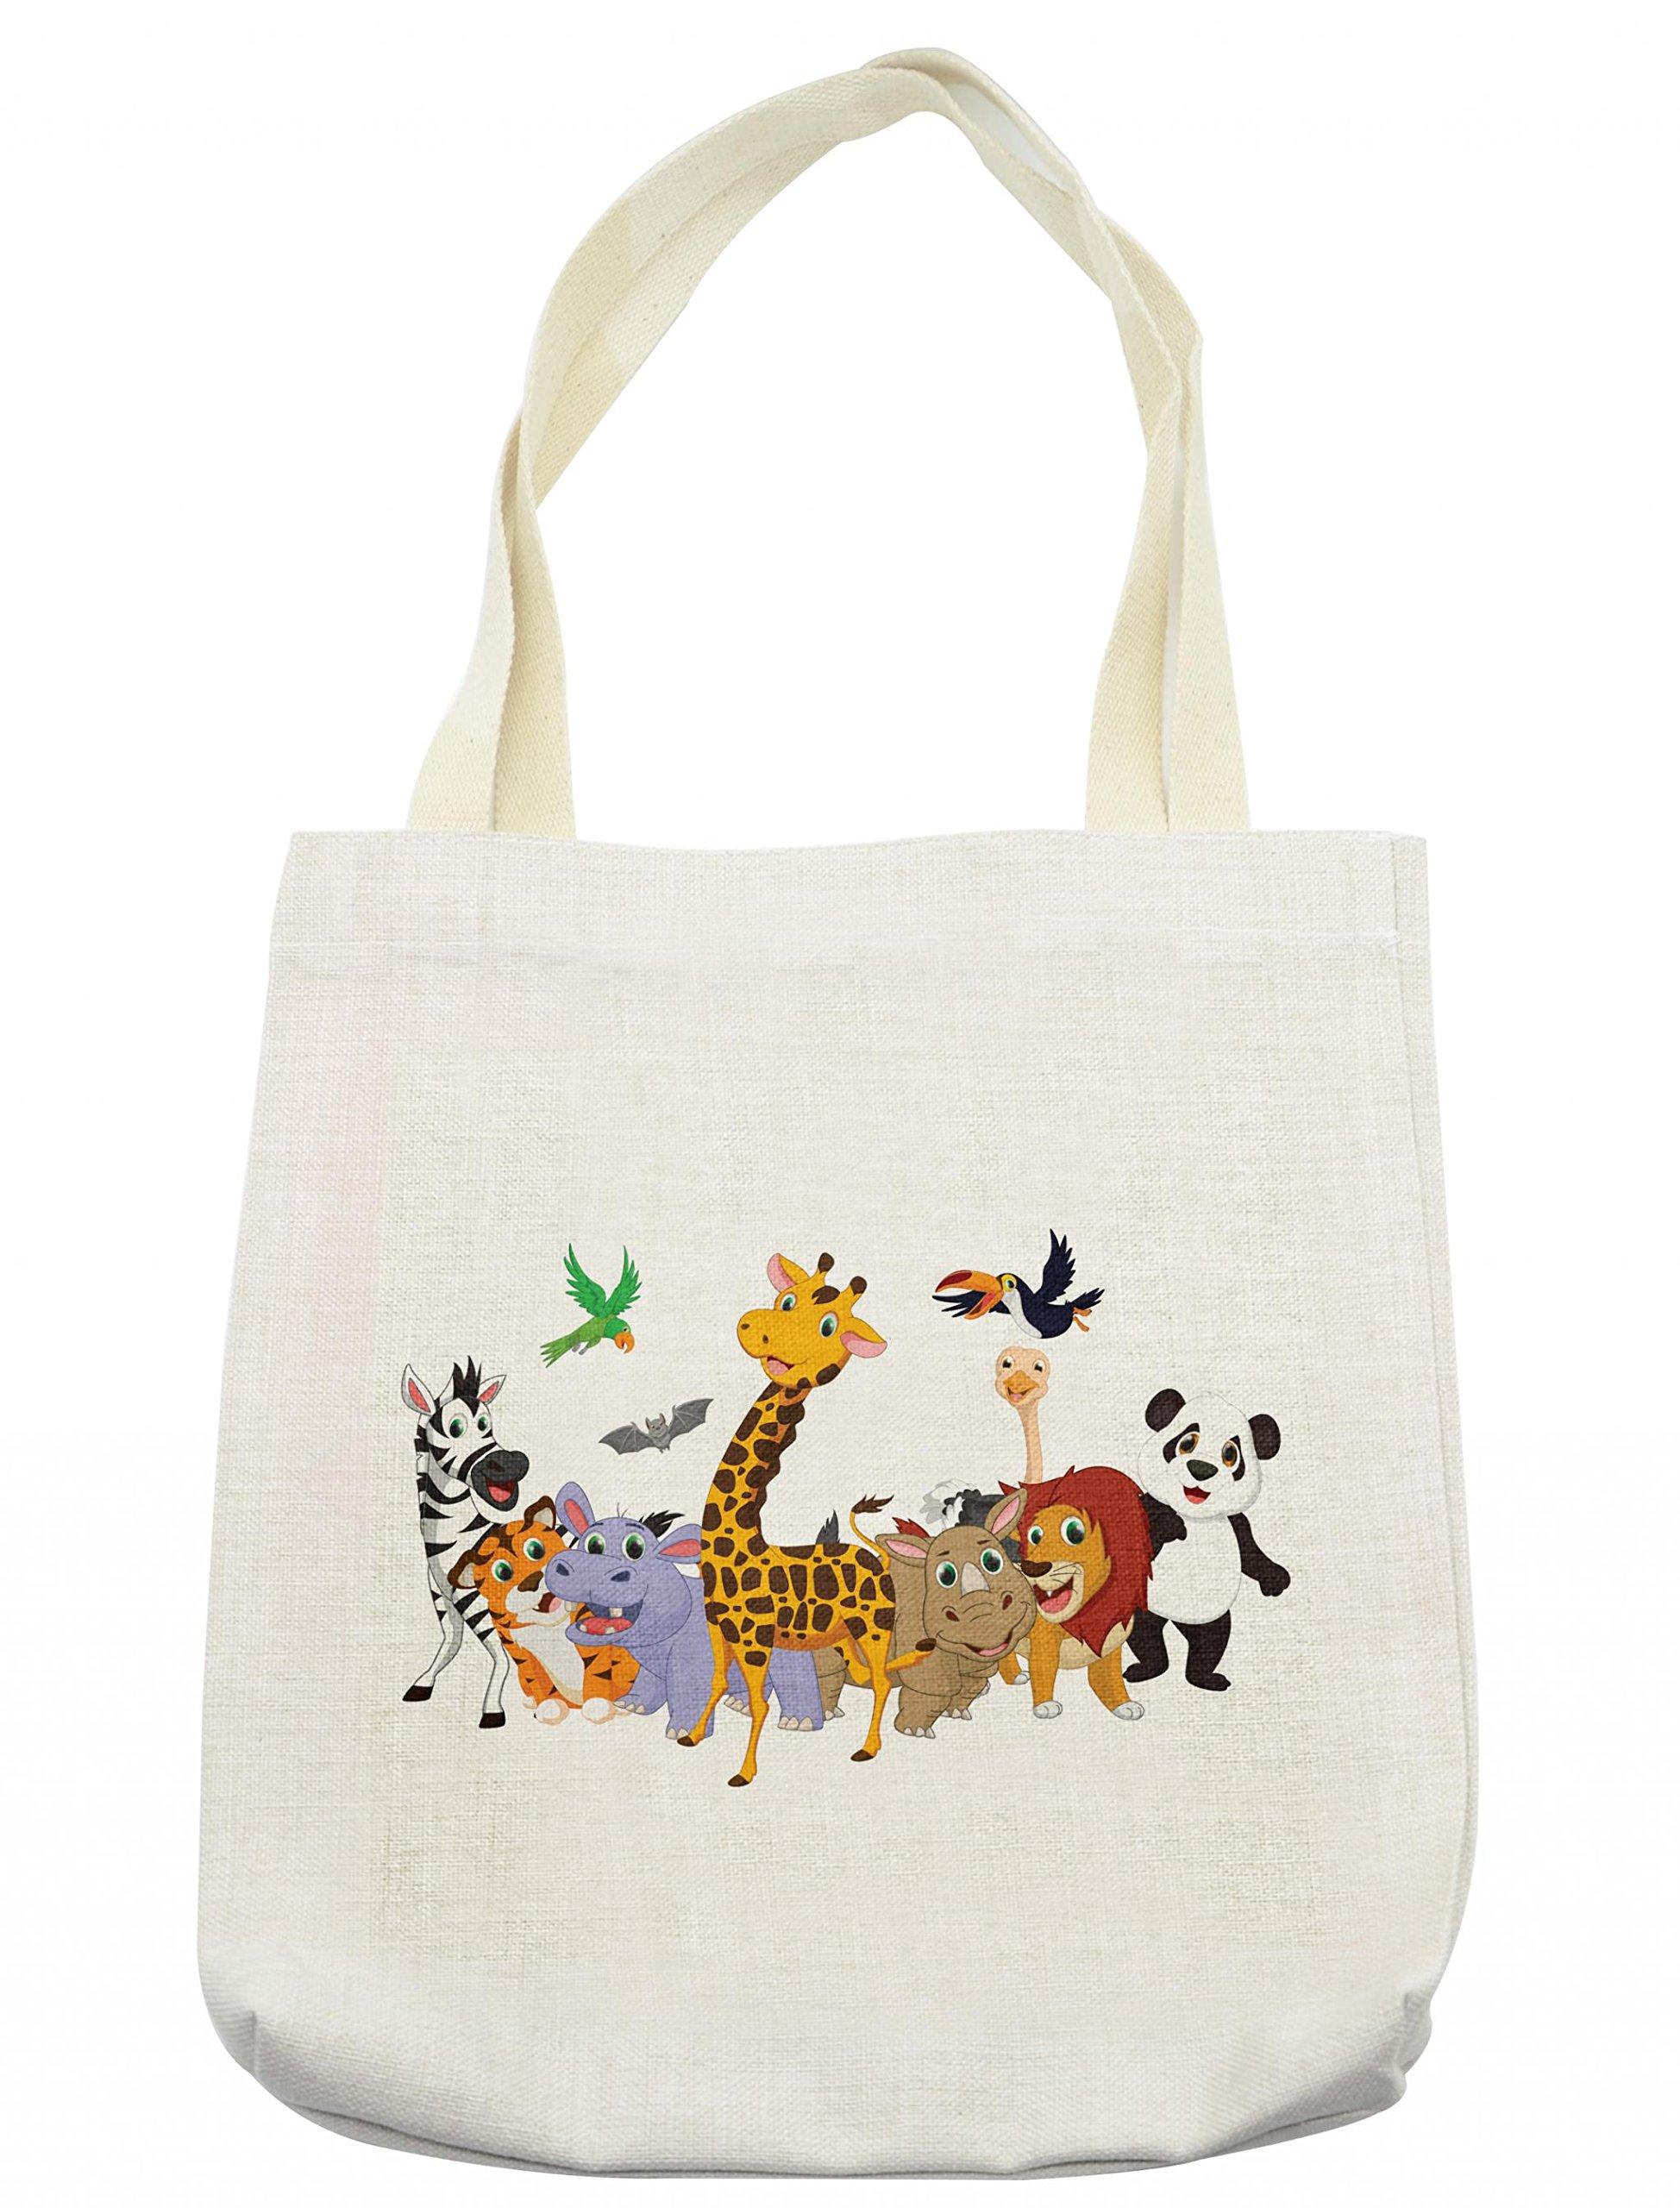 Lunarable Animals Tote Bag, Colorful Jungle Animals Hippo Bat Parrot Giraffe Rhino Panda Safari Theme African, Cloth Linen Reusable Bag for Shopping Groceries Books Beach Travel & More, Cream